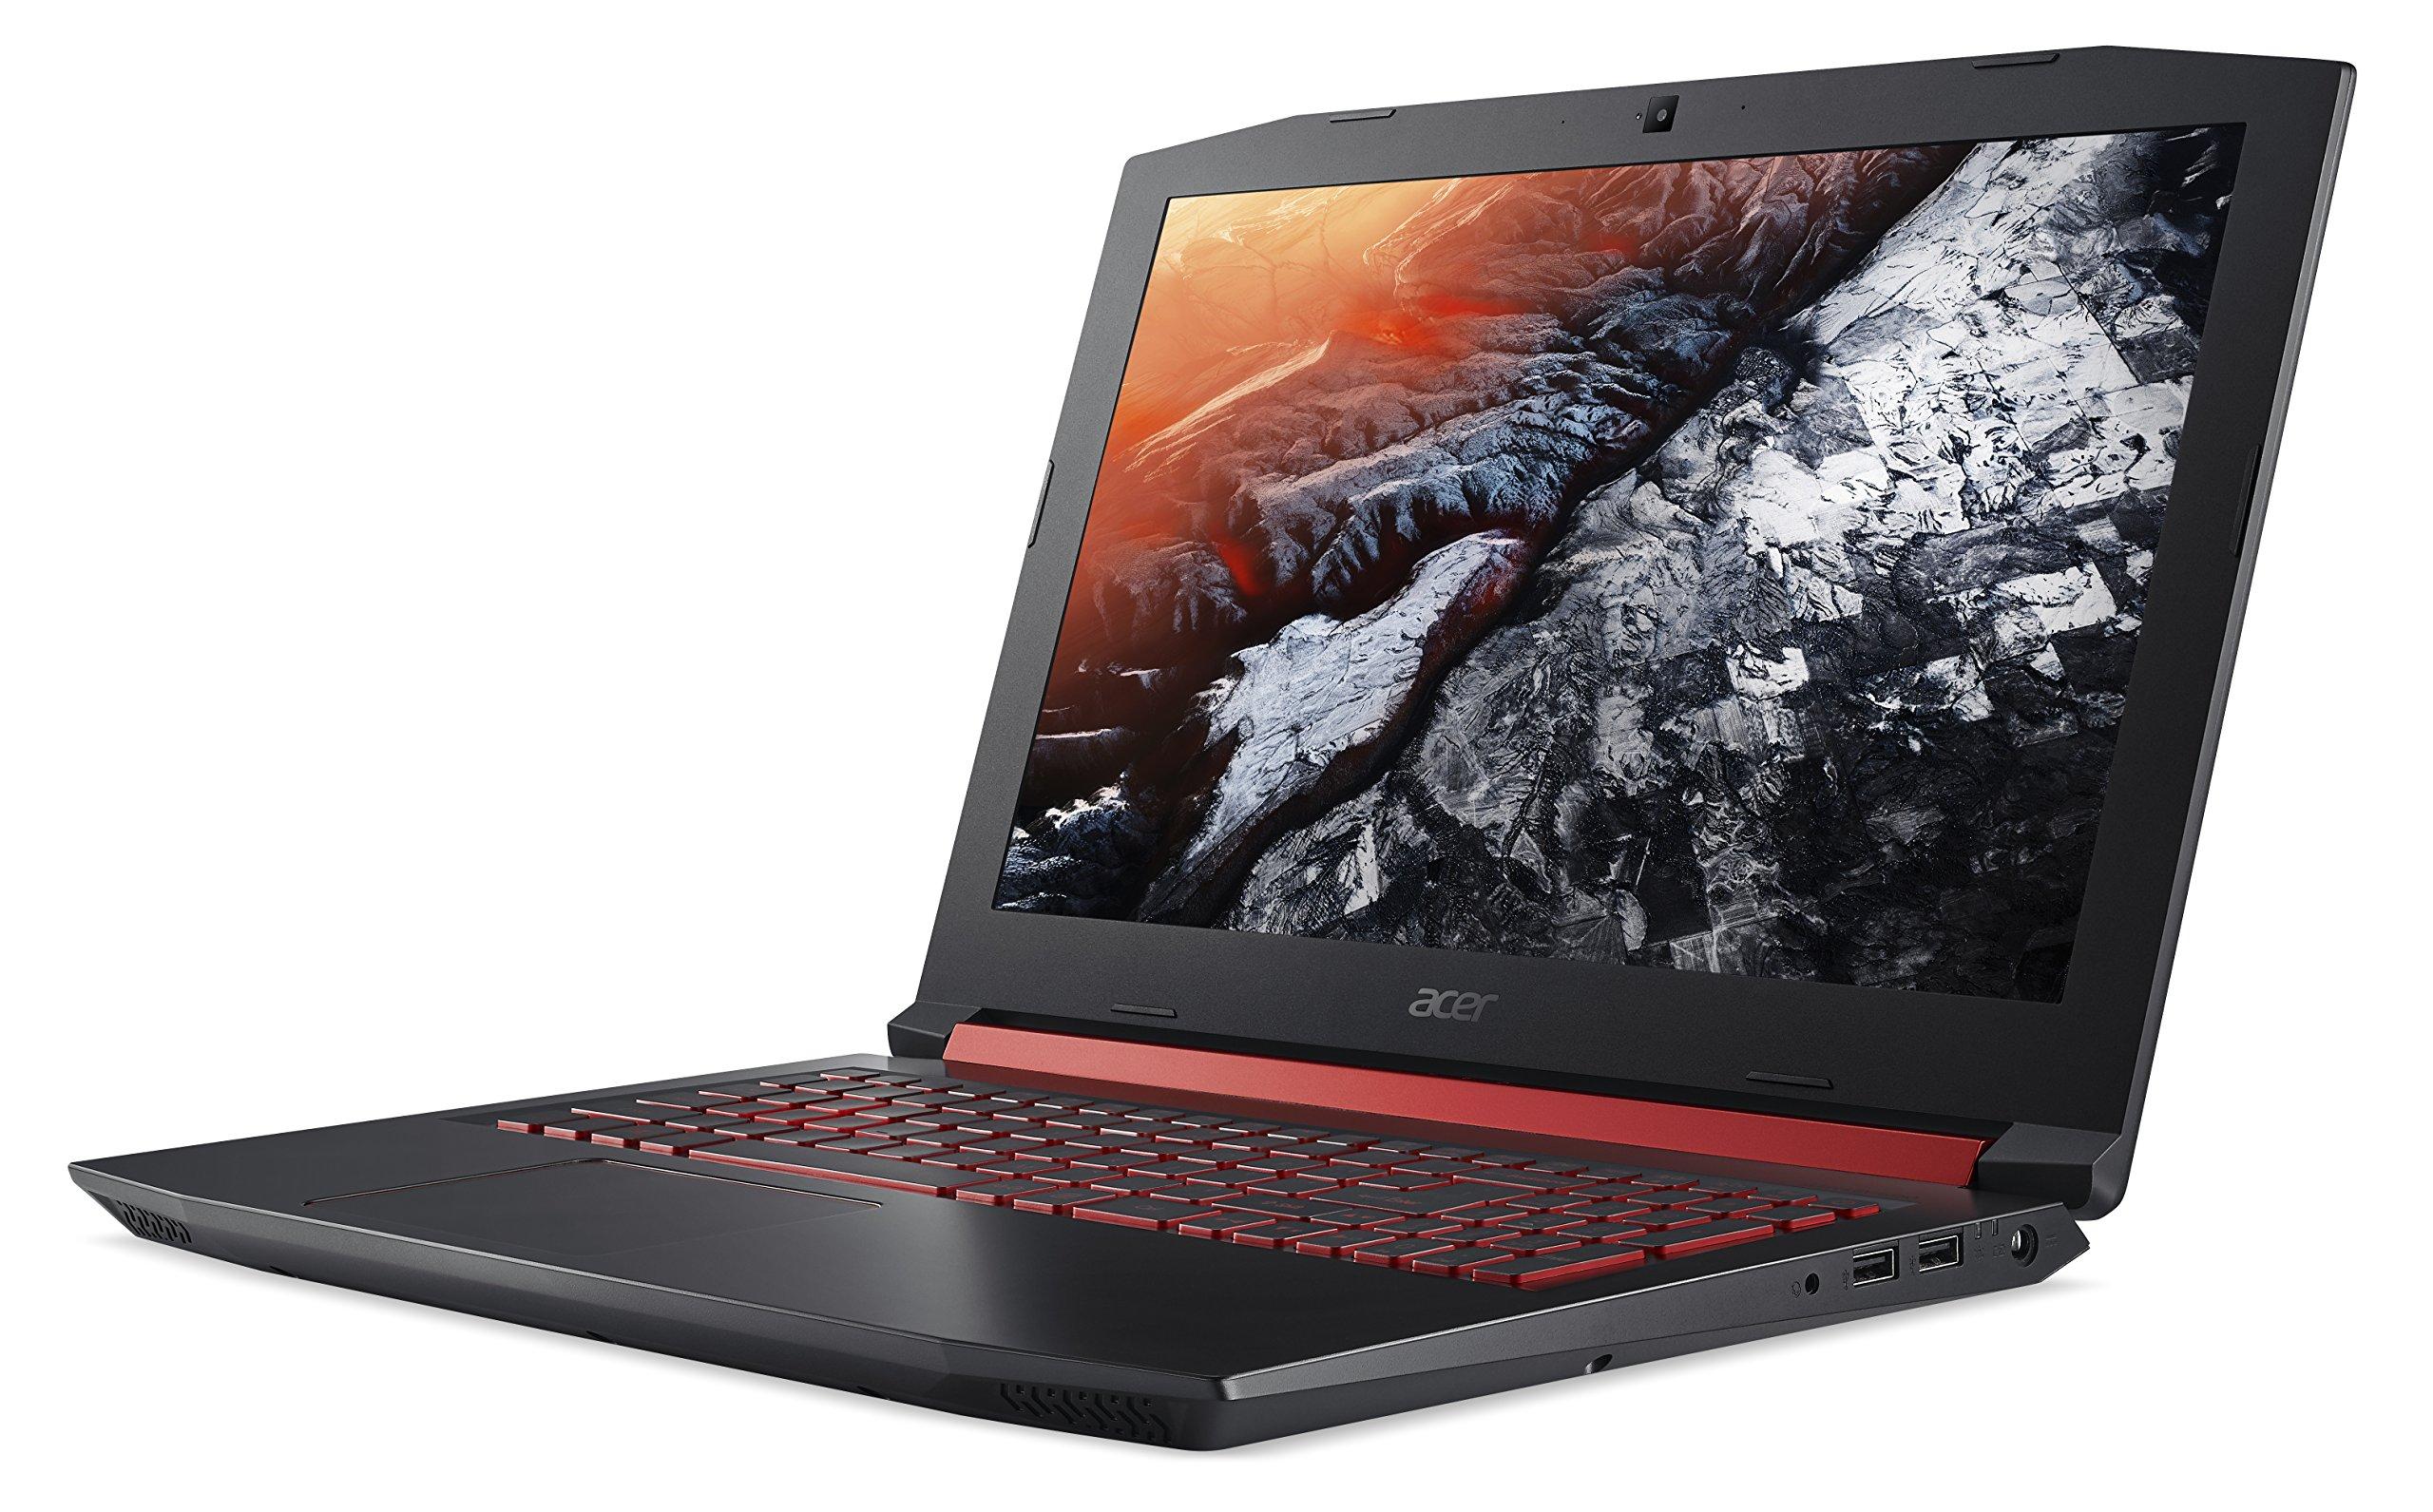 "Acer Nitro 5 Gaming Laptop, Intel Core i5-7300HQ, GeForce GTX 1050 Ti, 15.6"" Full HD, 8GB DDR4, 256GB SSD, AN515-51-55WL 3"